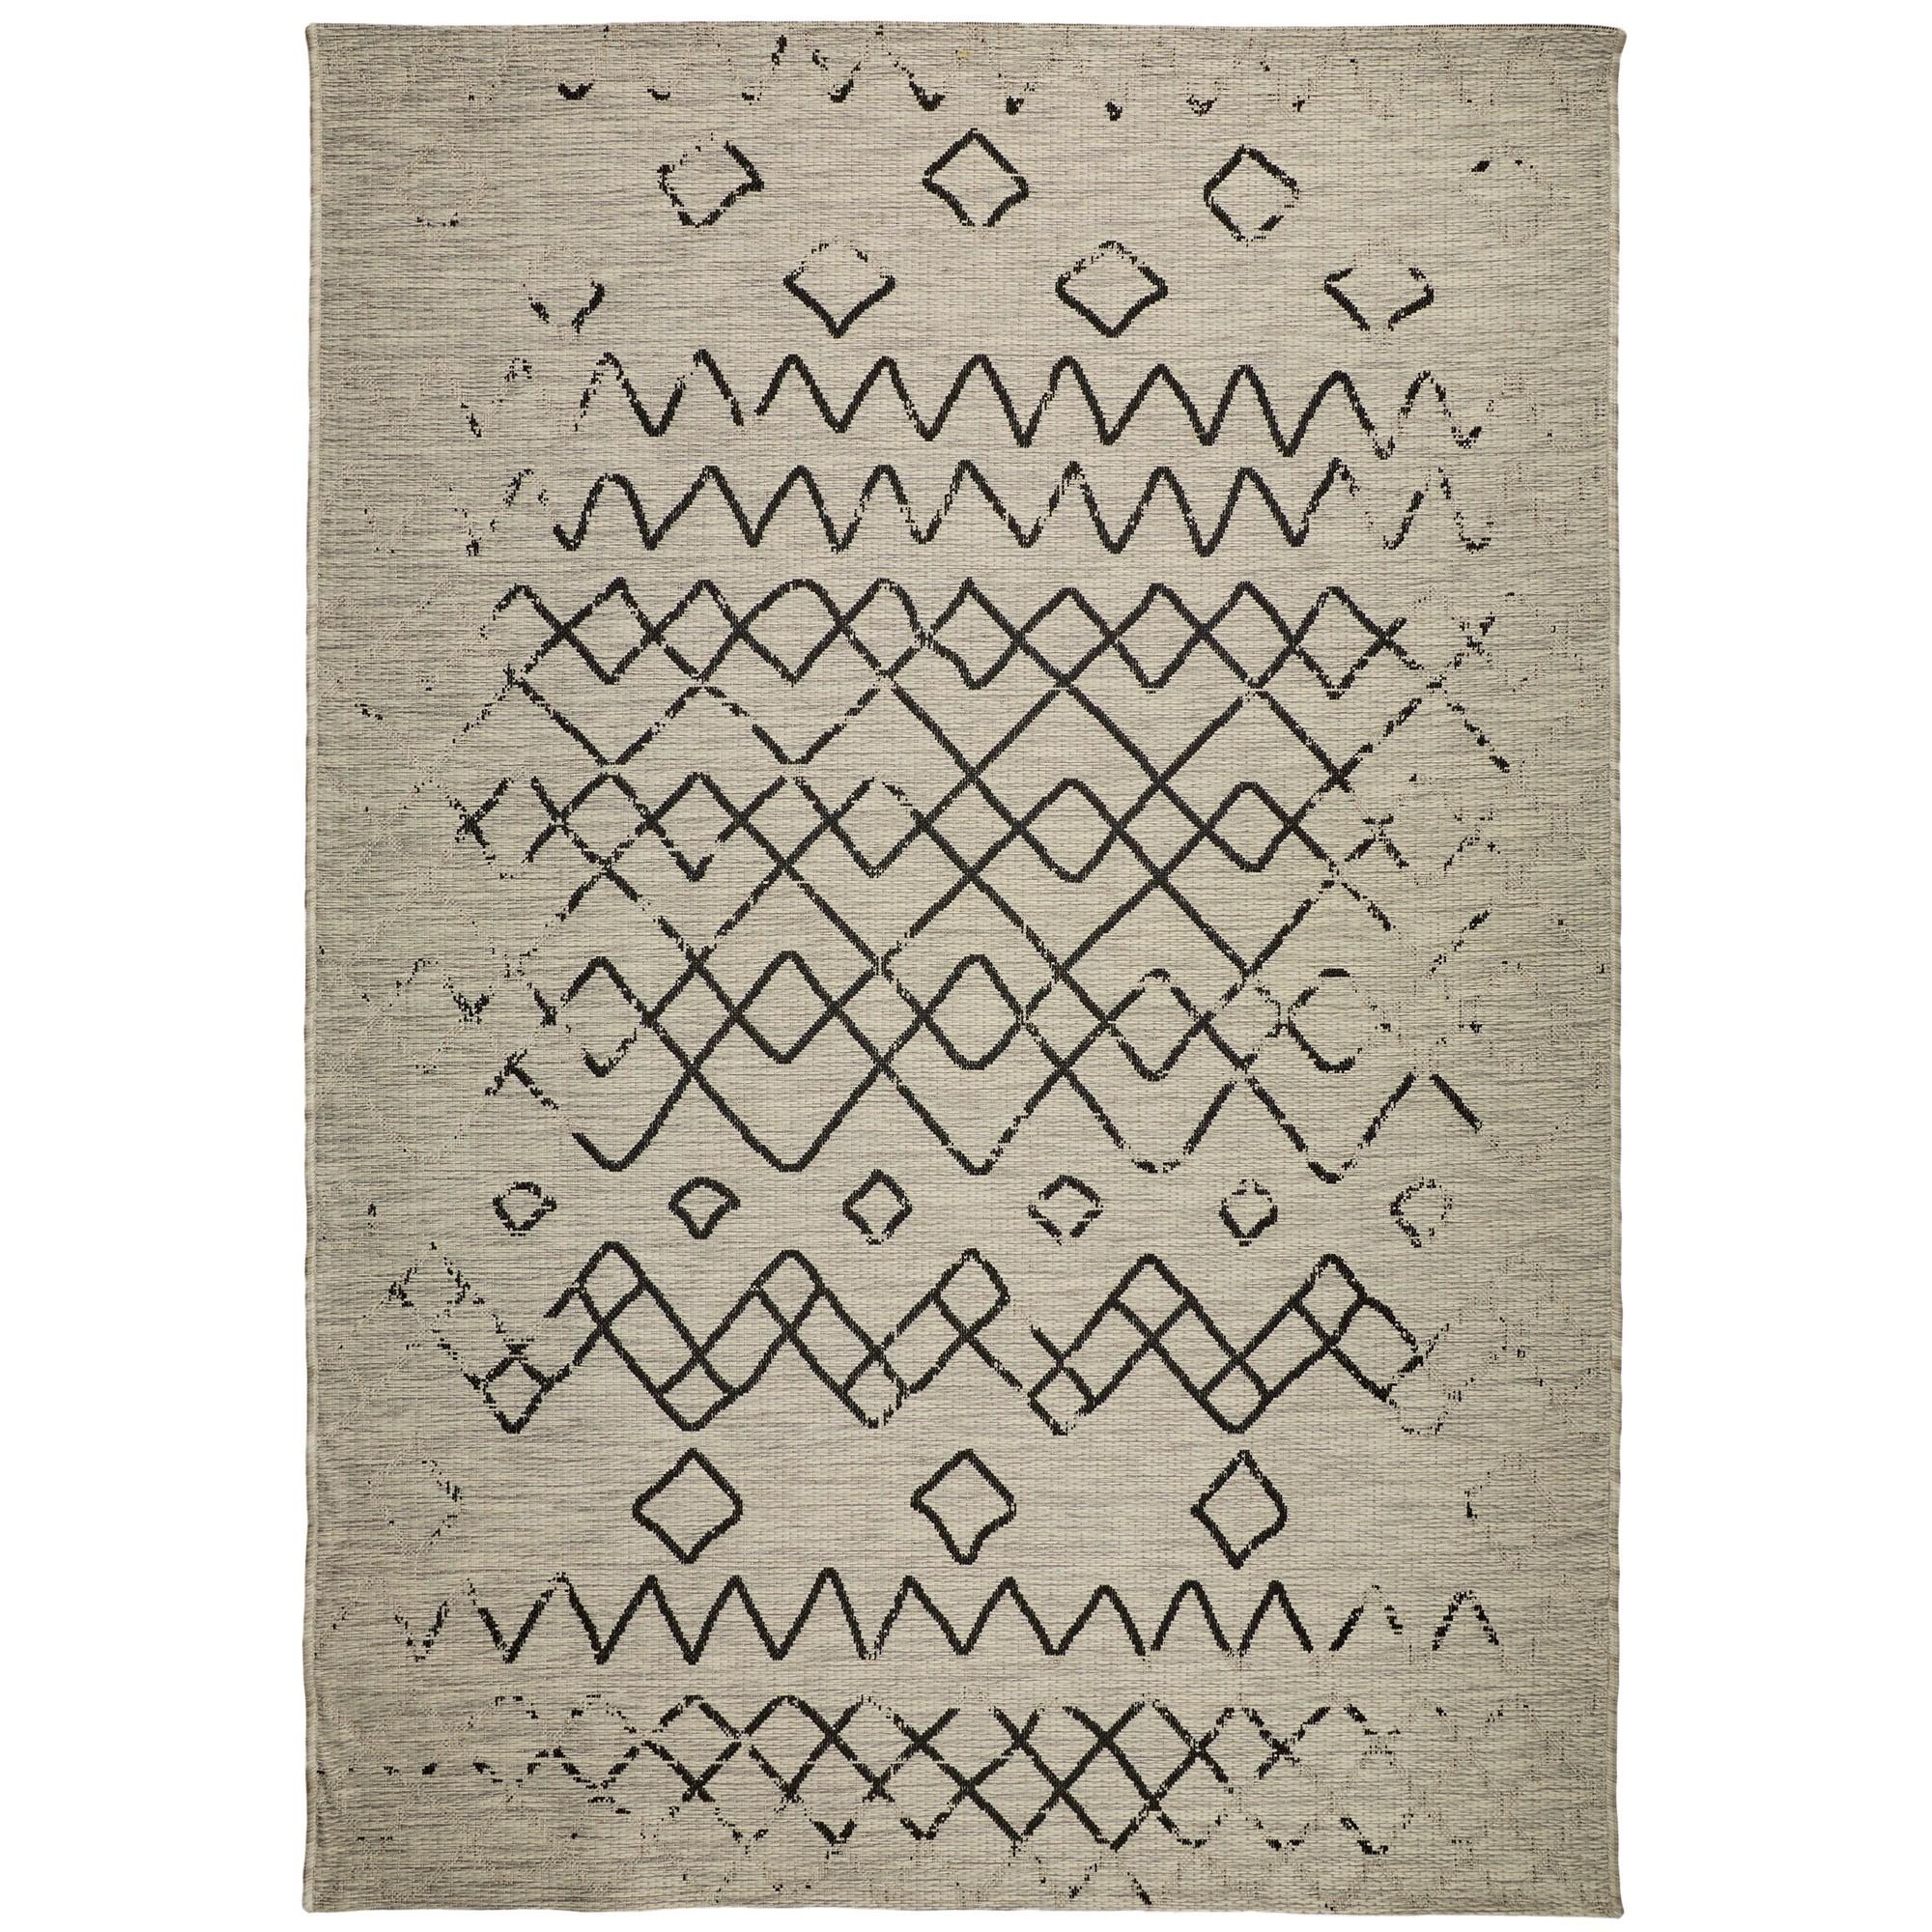 Magic No.304 Modern Tribal Indoor / Outdoor Rug, 330x240cm, Silver